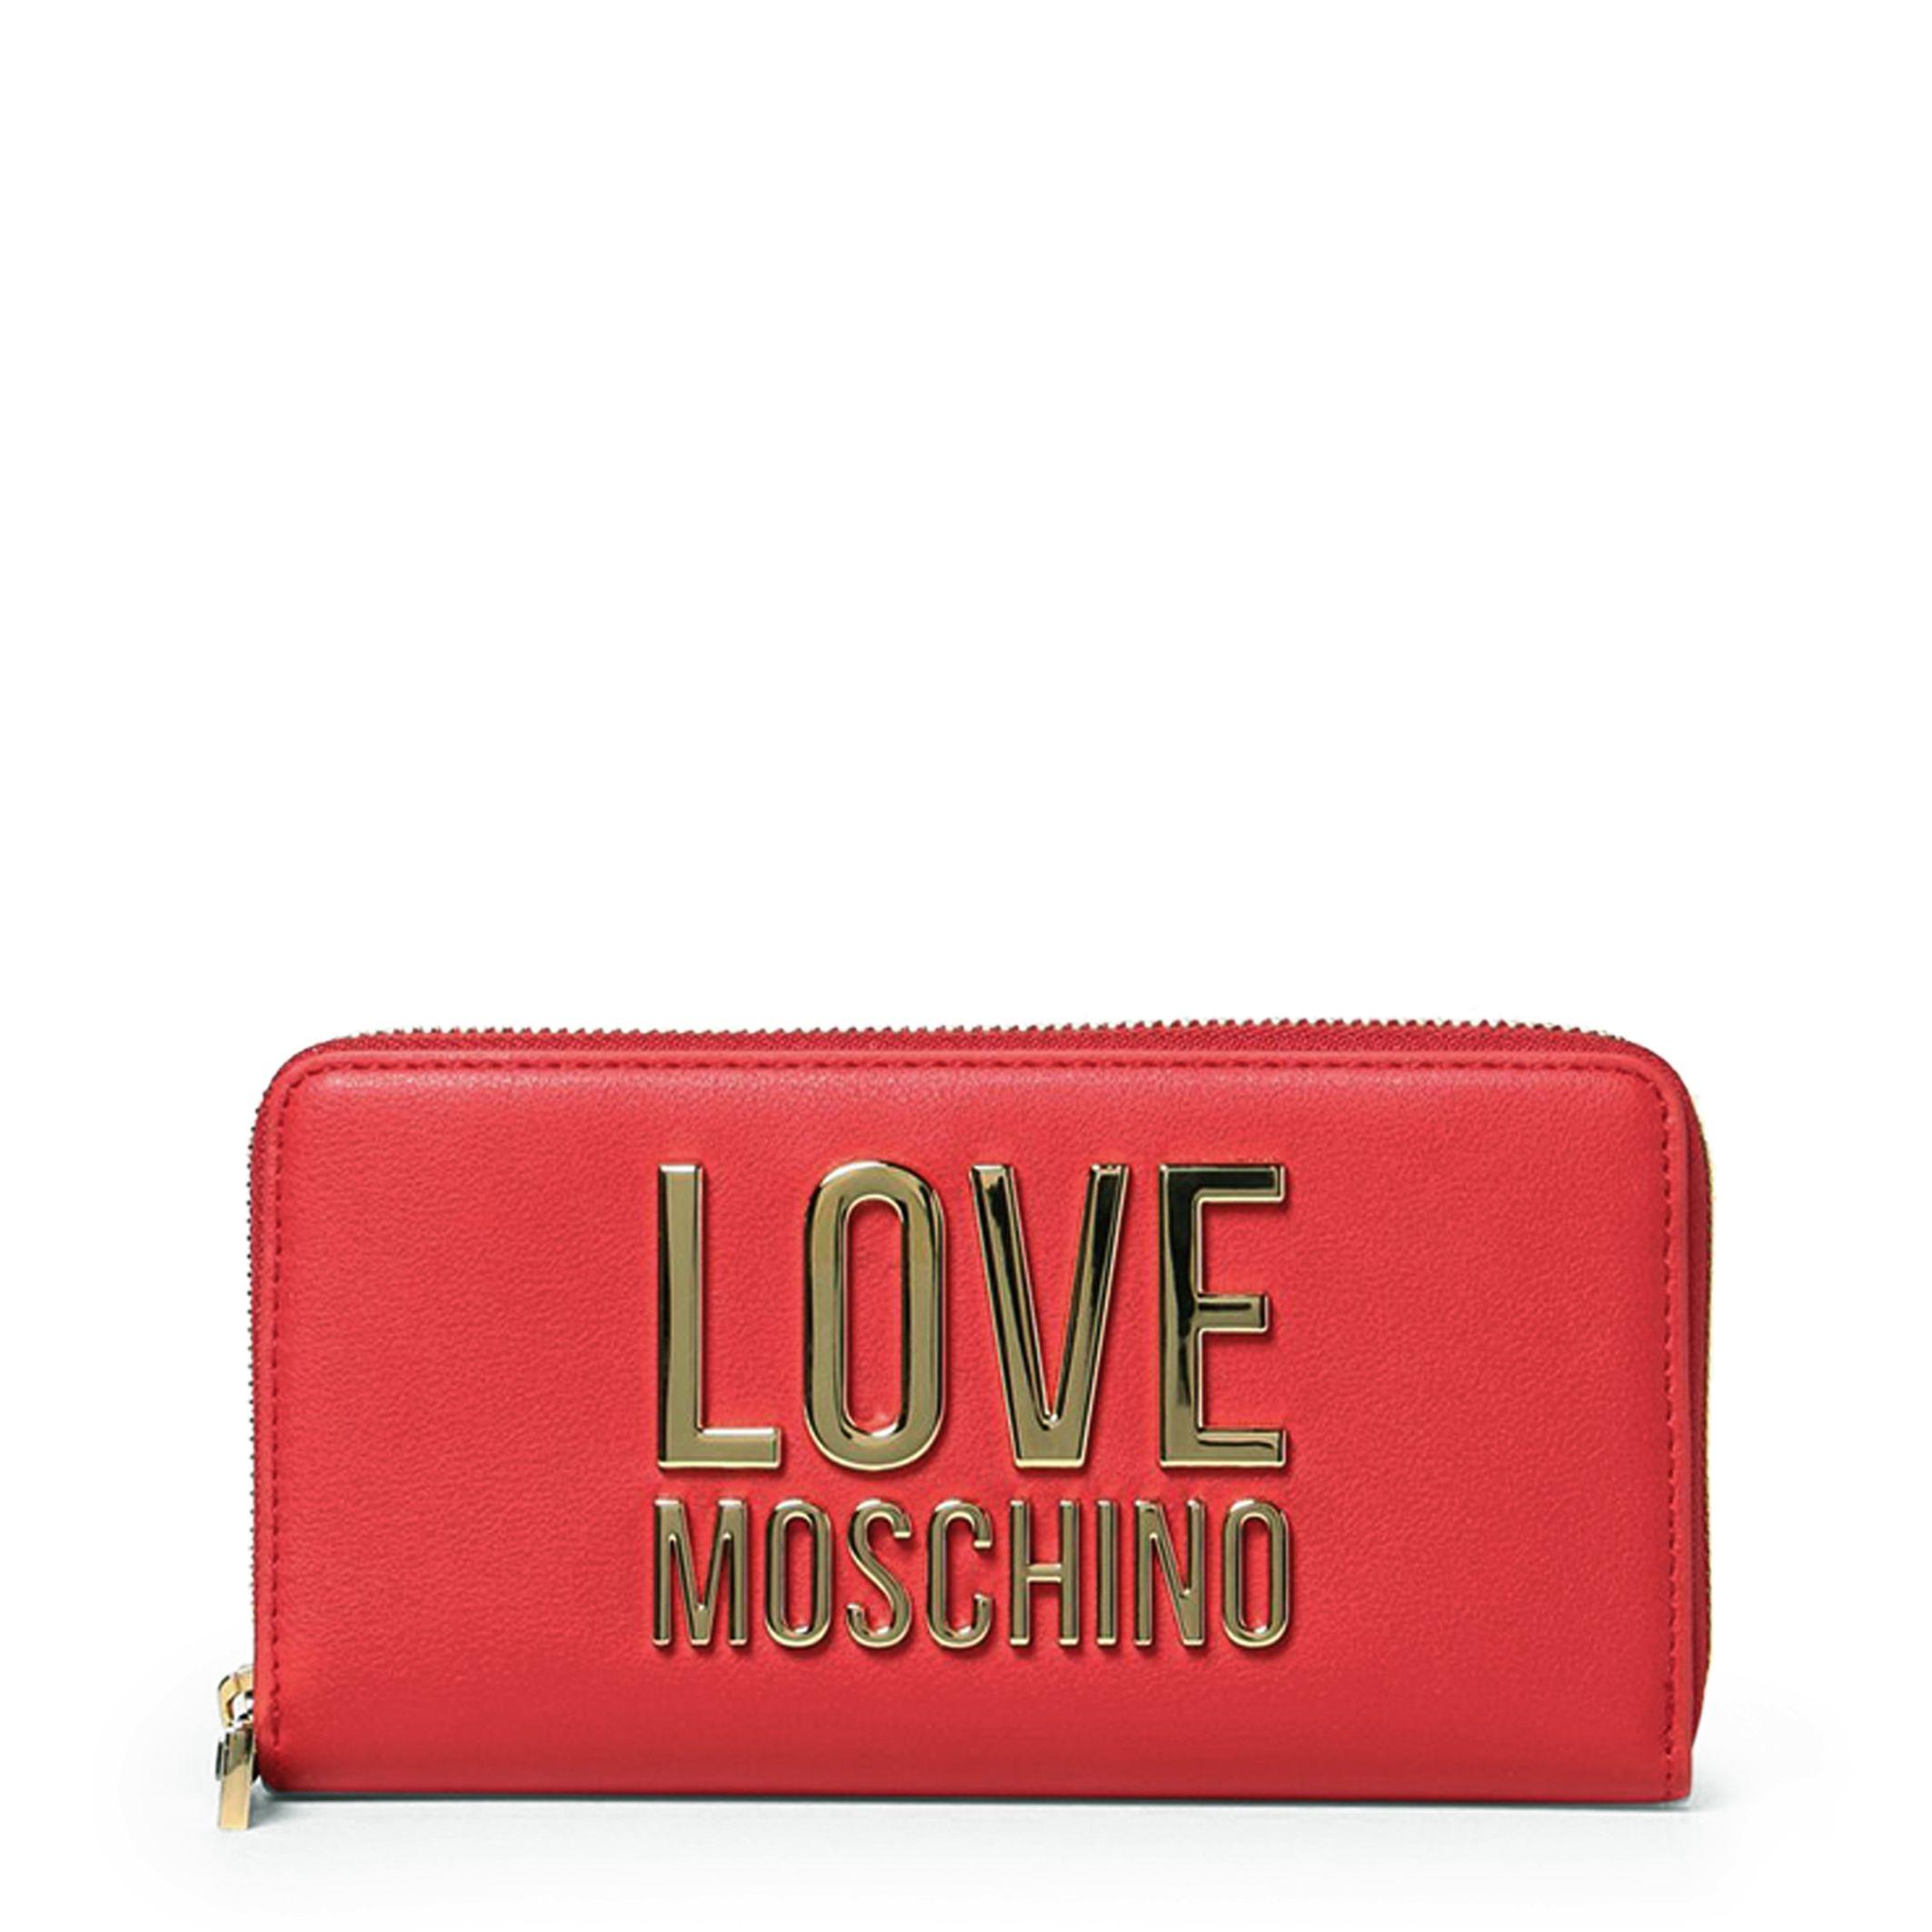 Love Moschino – JC5611PP1DLJ0 – Rood Designeritems.nl